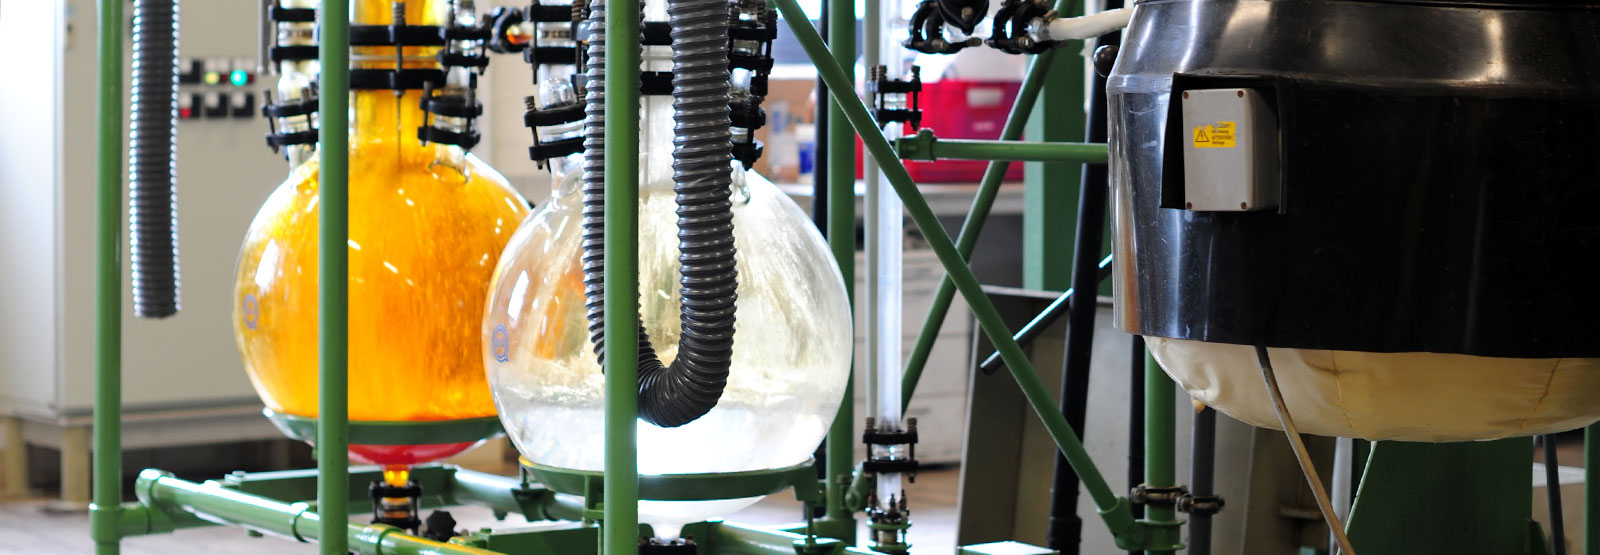 C Hafner – Precious metal recycling technology